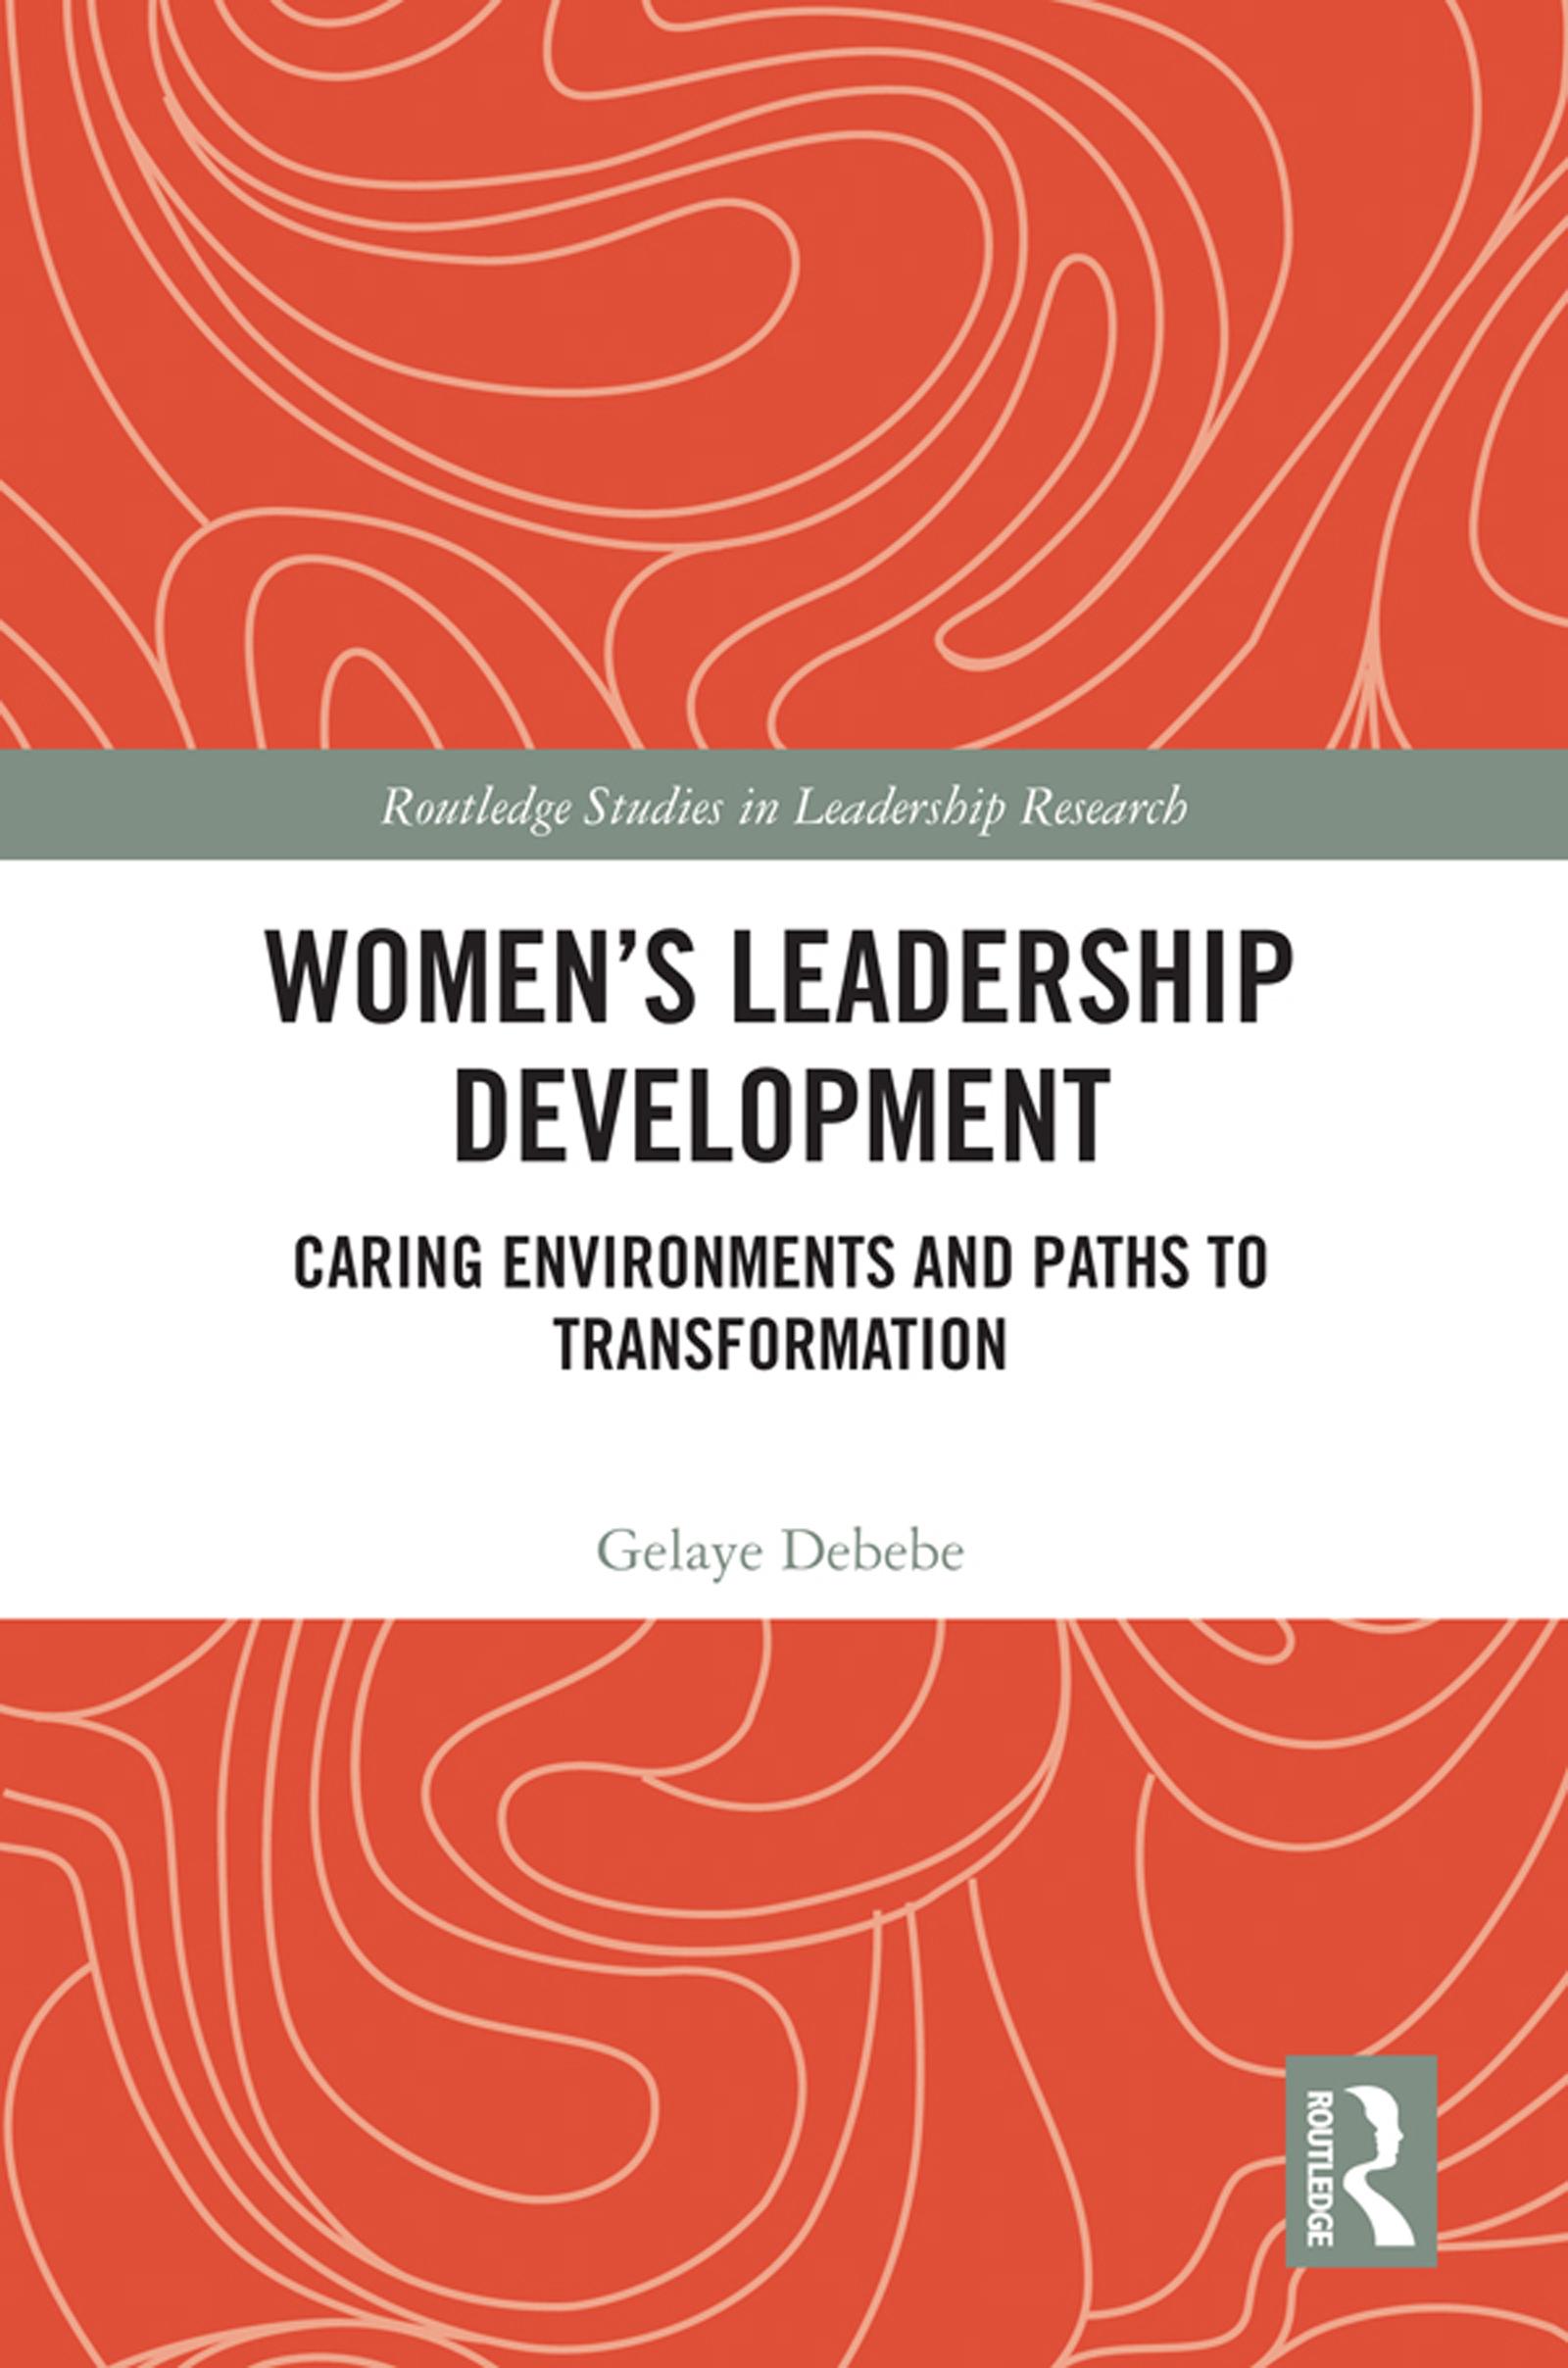 Women's Leadership Development